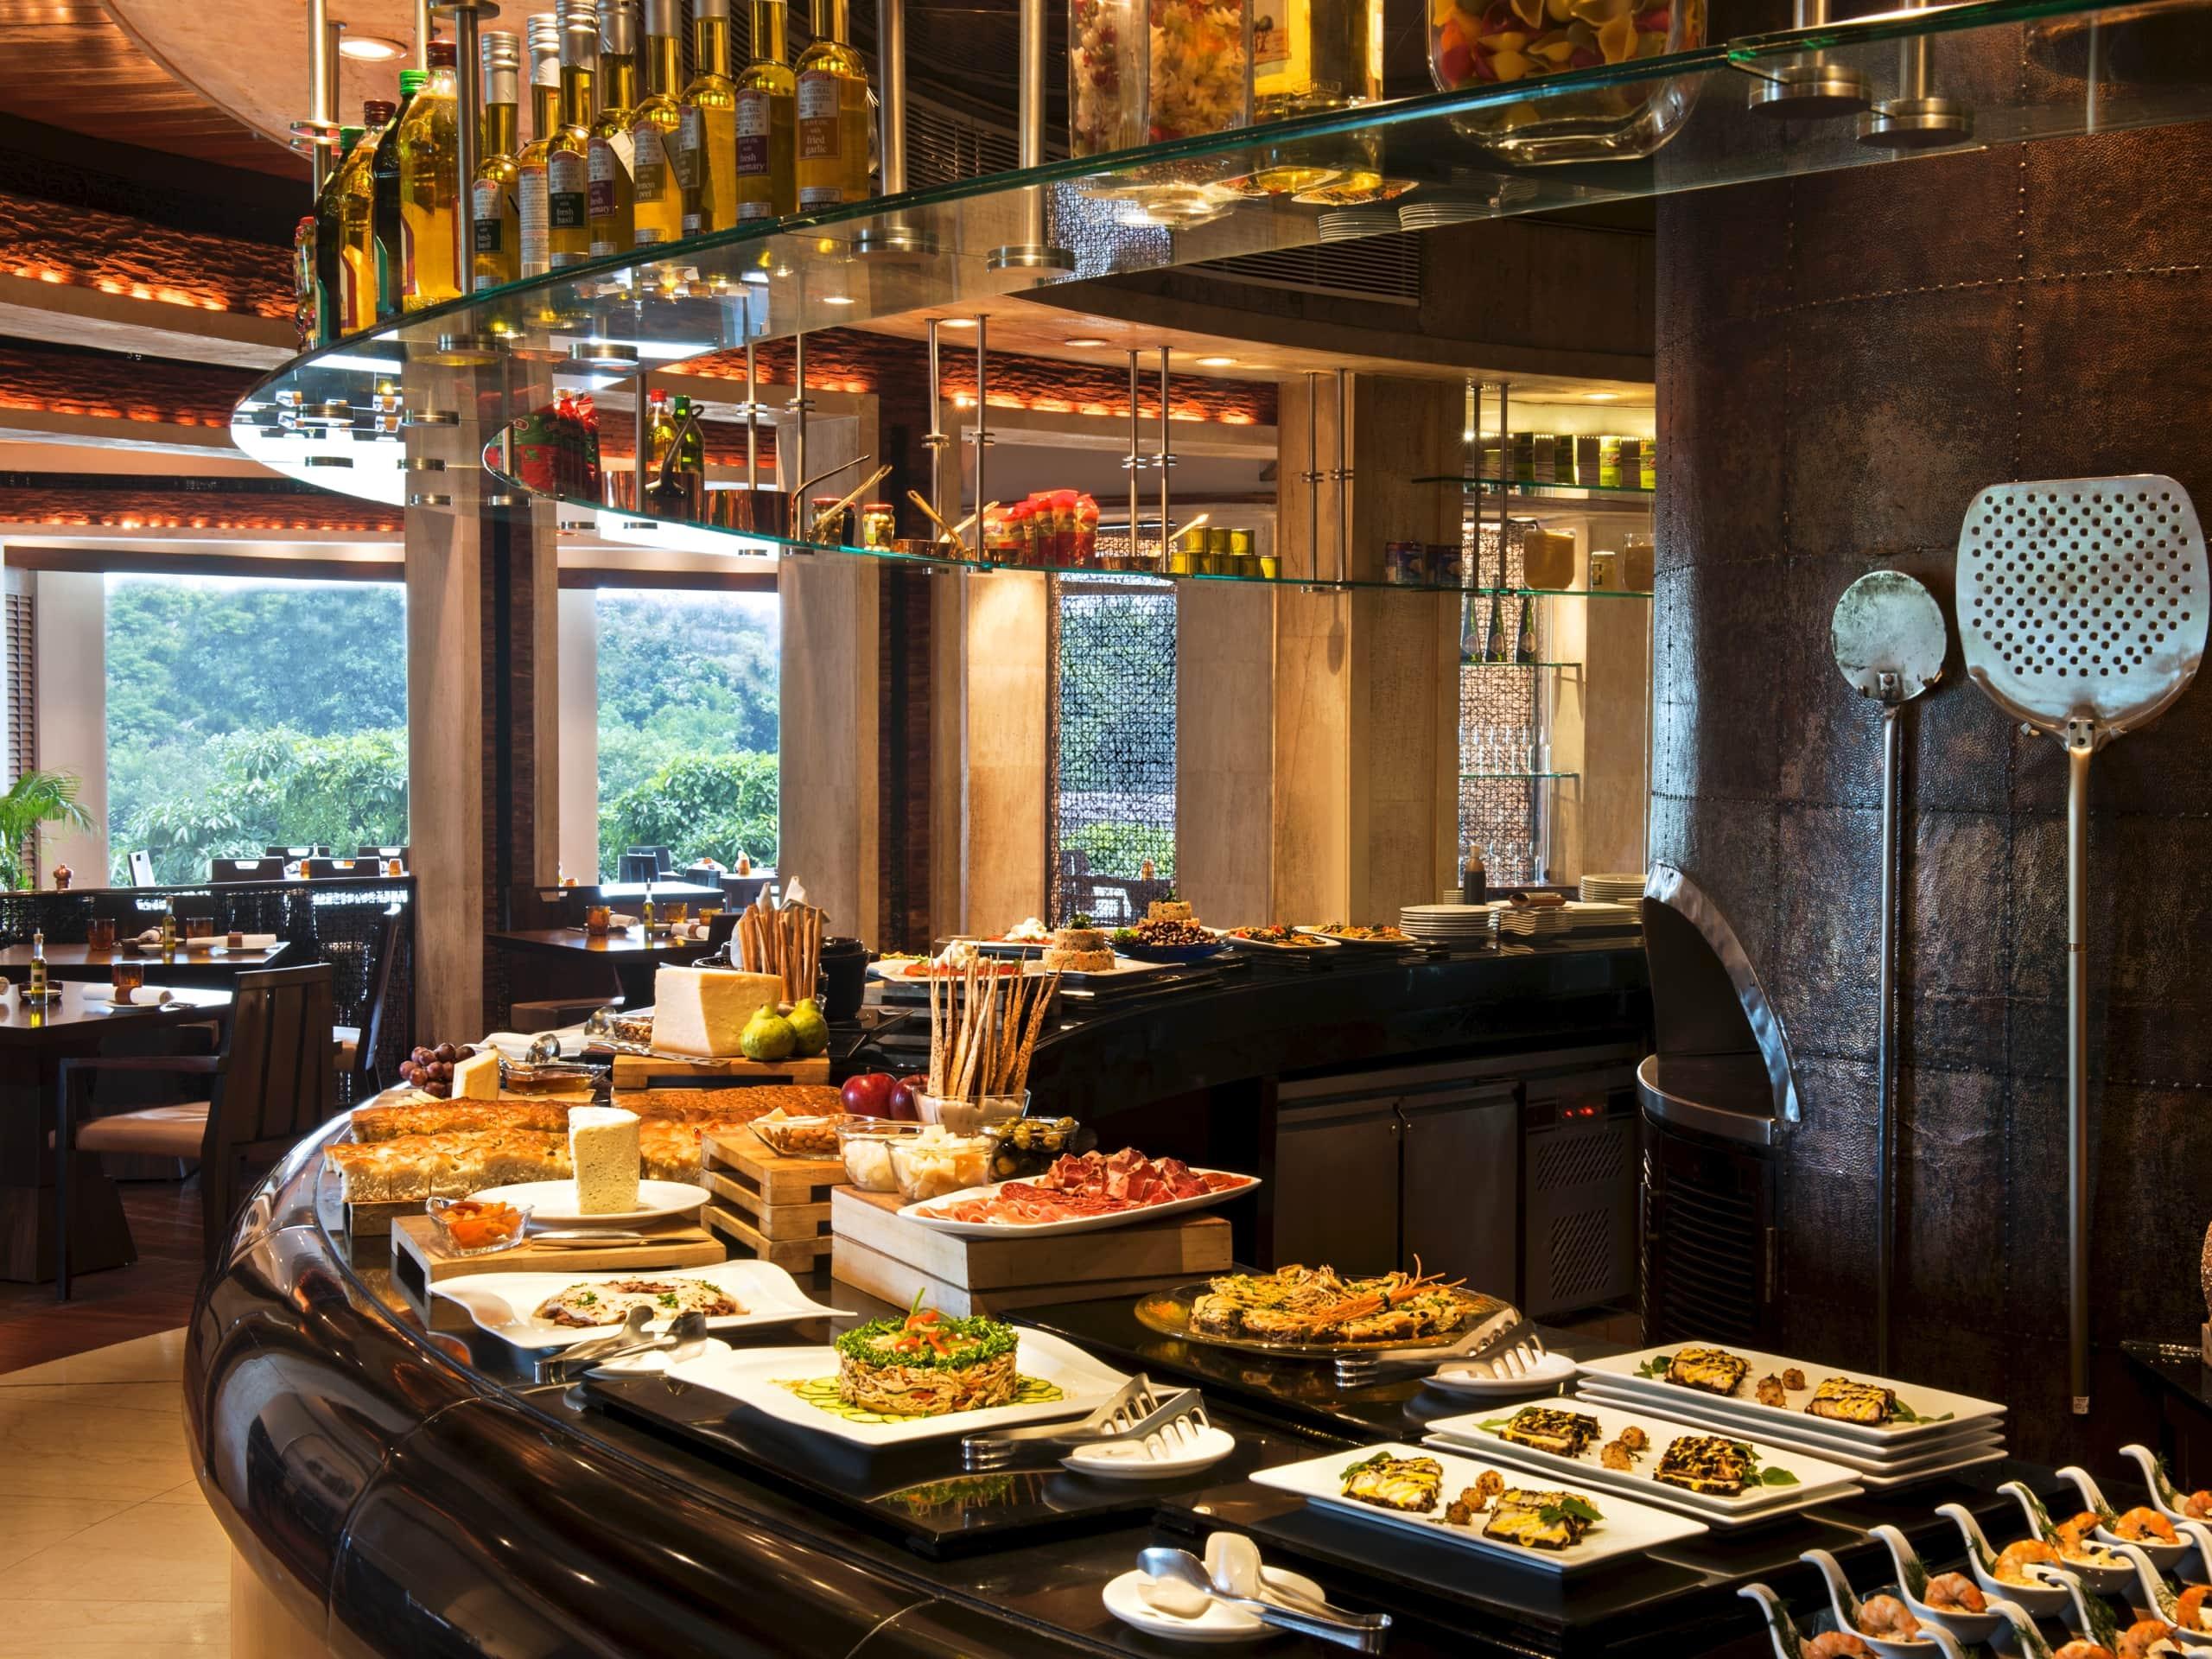 Buffet Restaurant Italian Restaurant North Indian